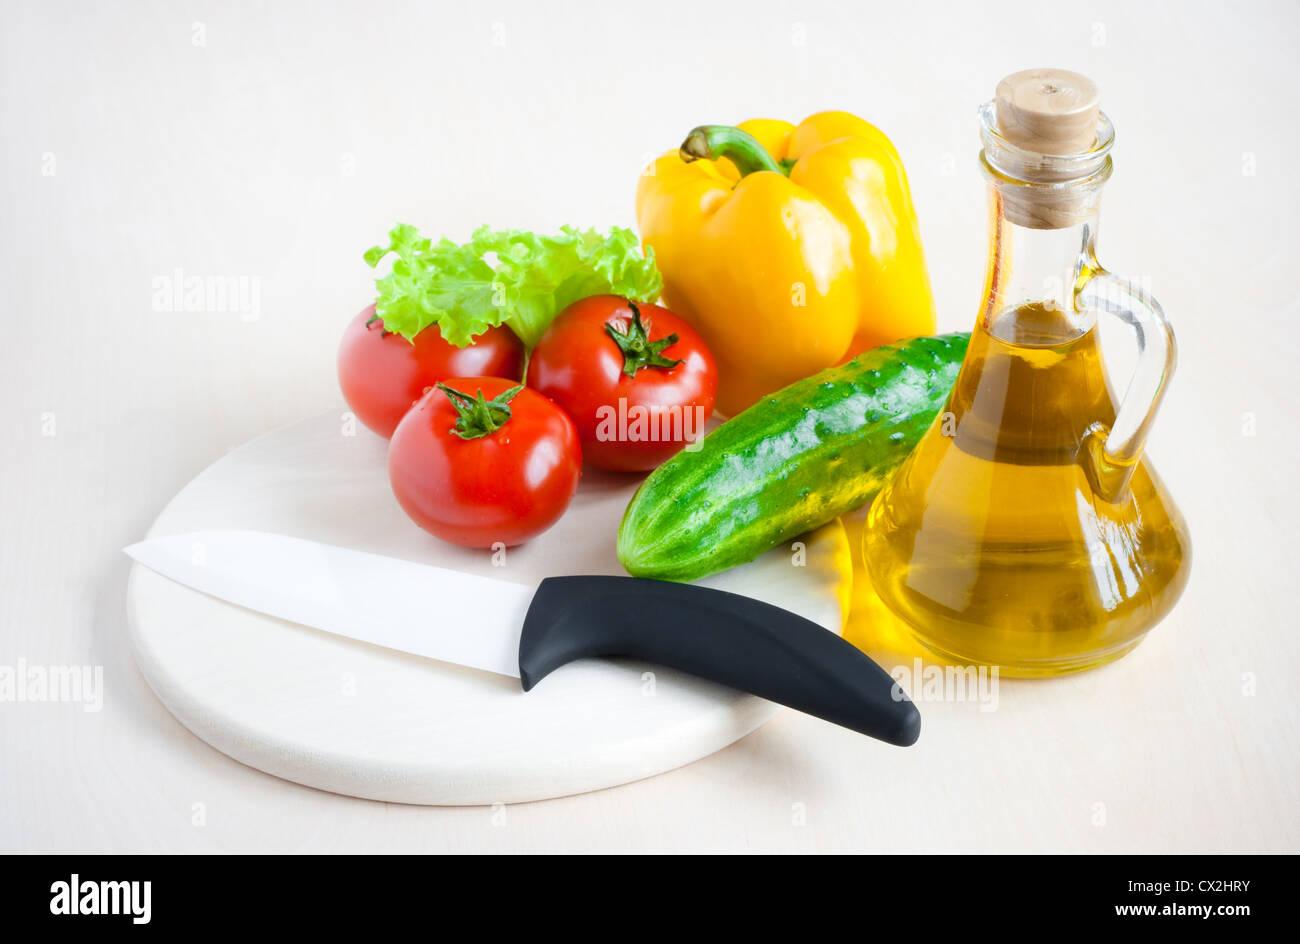 Healthy food still life - Stock Image